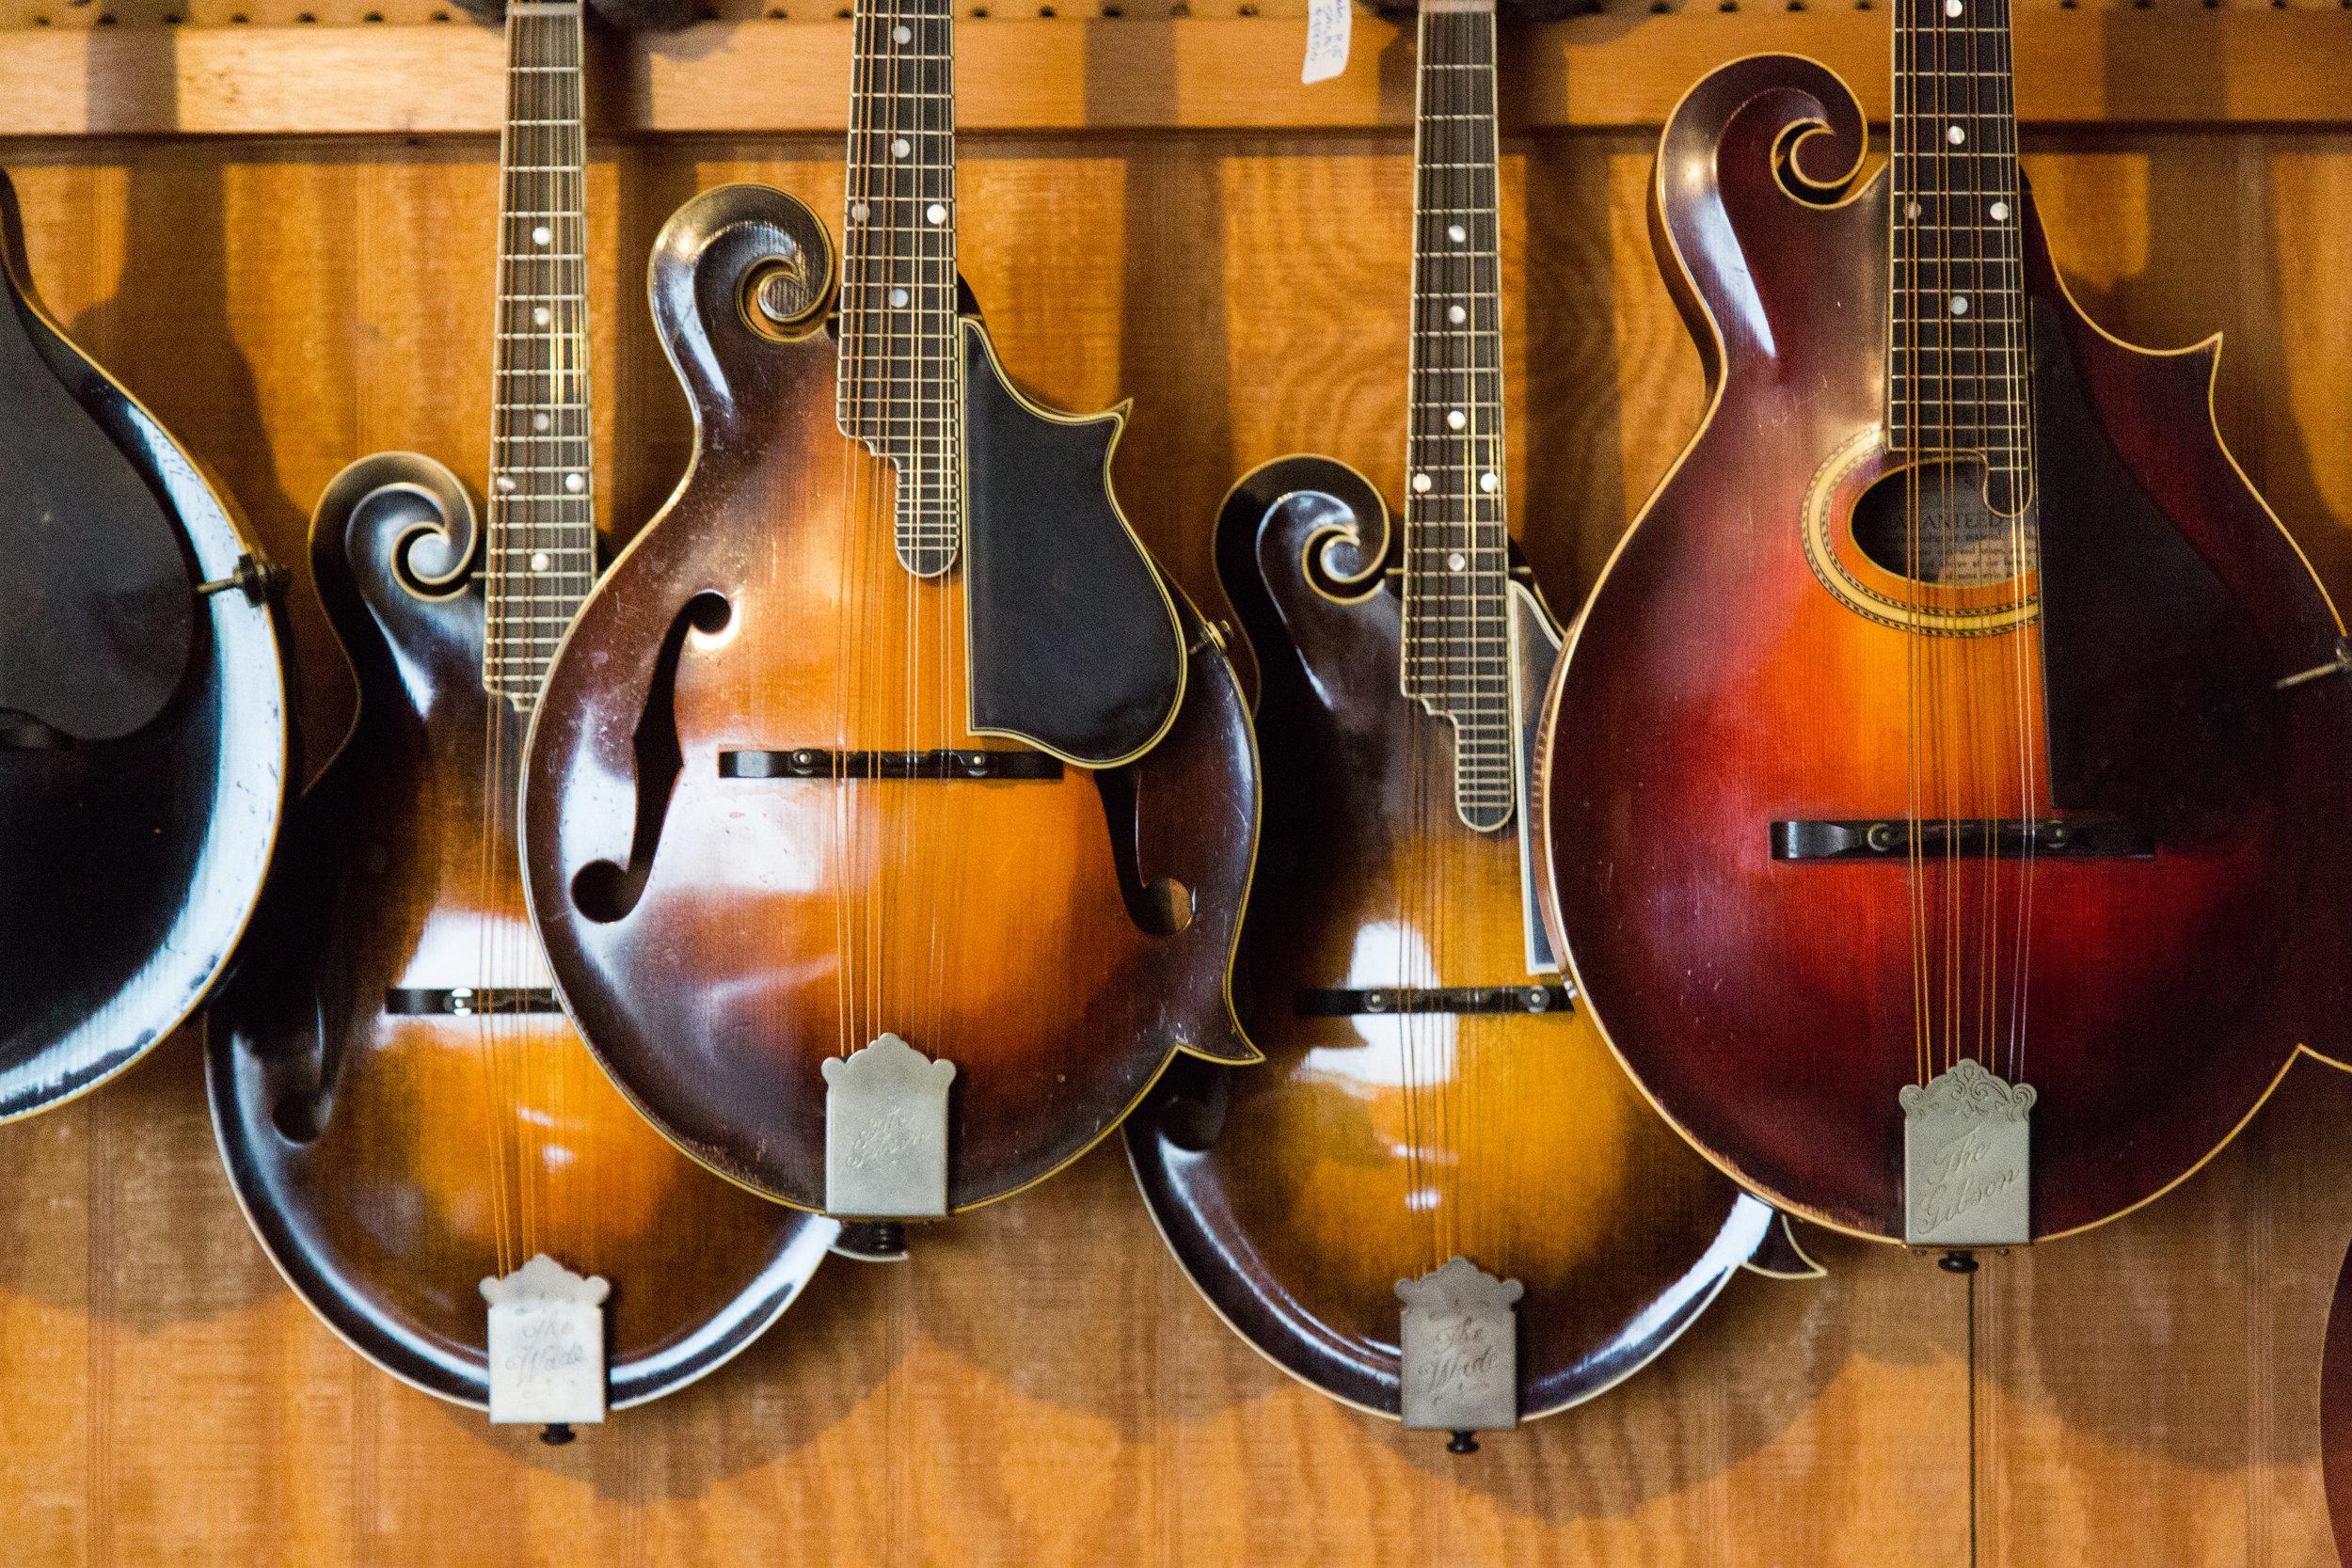 A small sampling of mandolins Tony carefully stores and maintains at Mandolin Central.